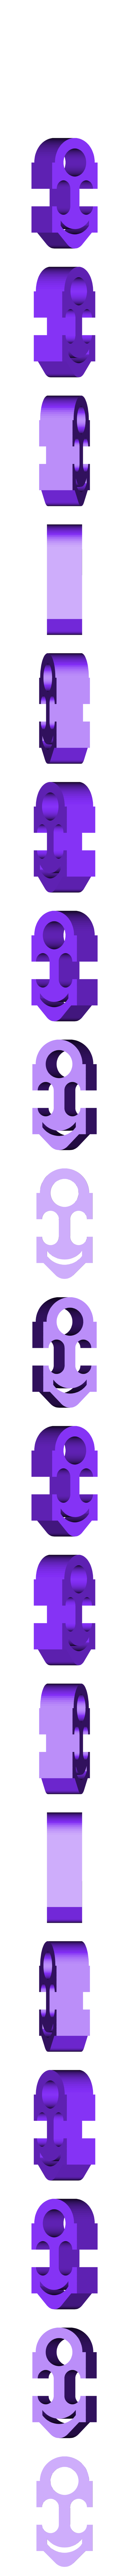 Head.stl Download free STL file Numerical Scale • 3D printable design, Duskwin